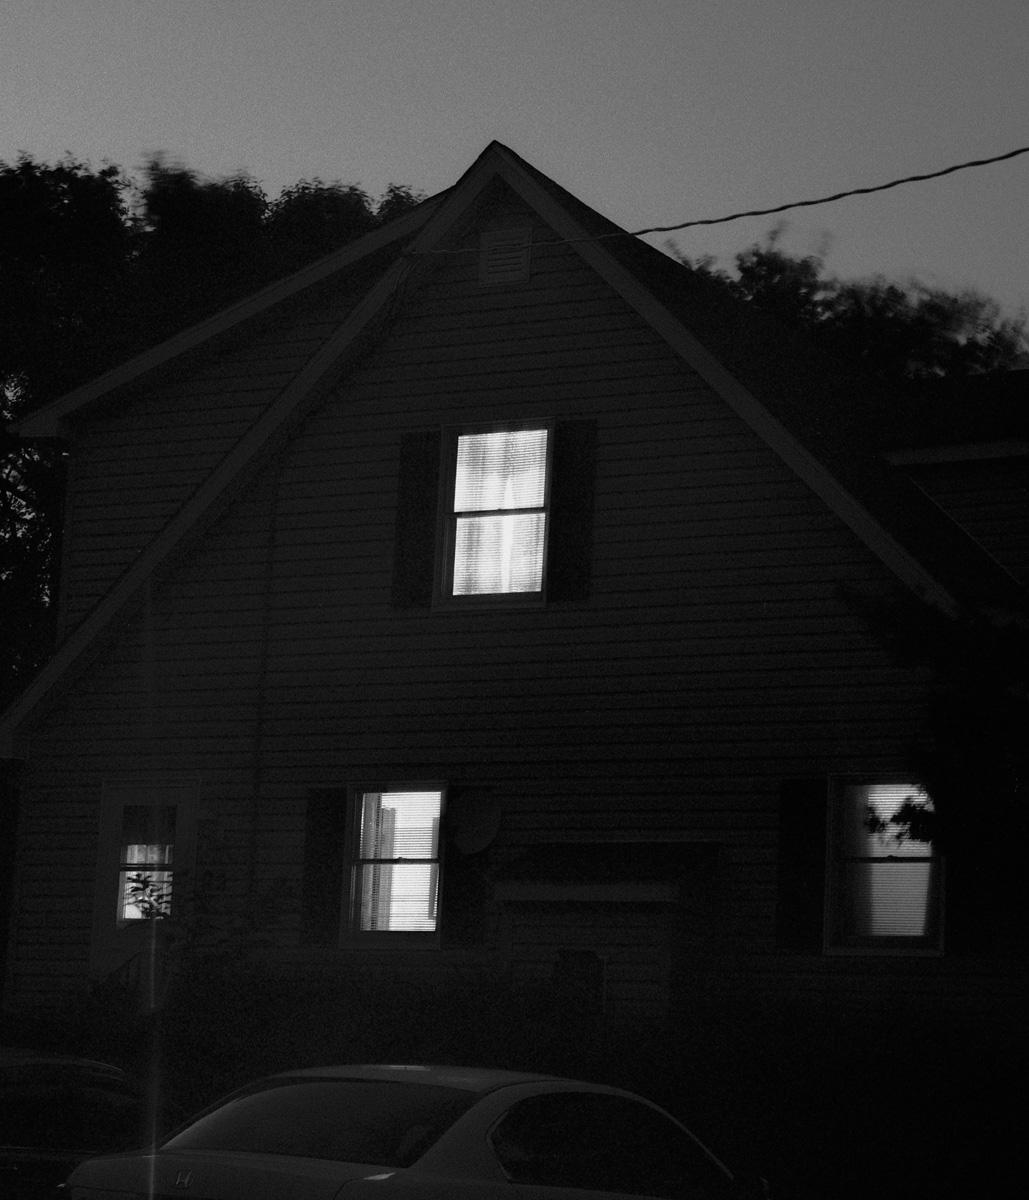 Josh Chaney Nuclear Family C41magazine Photography 15